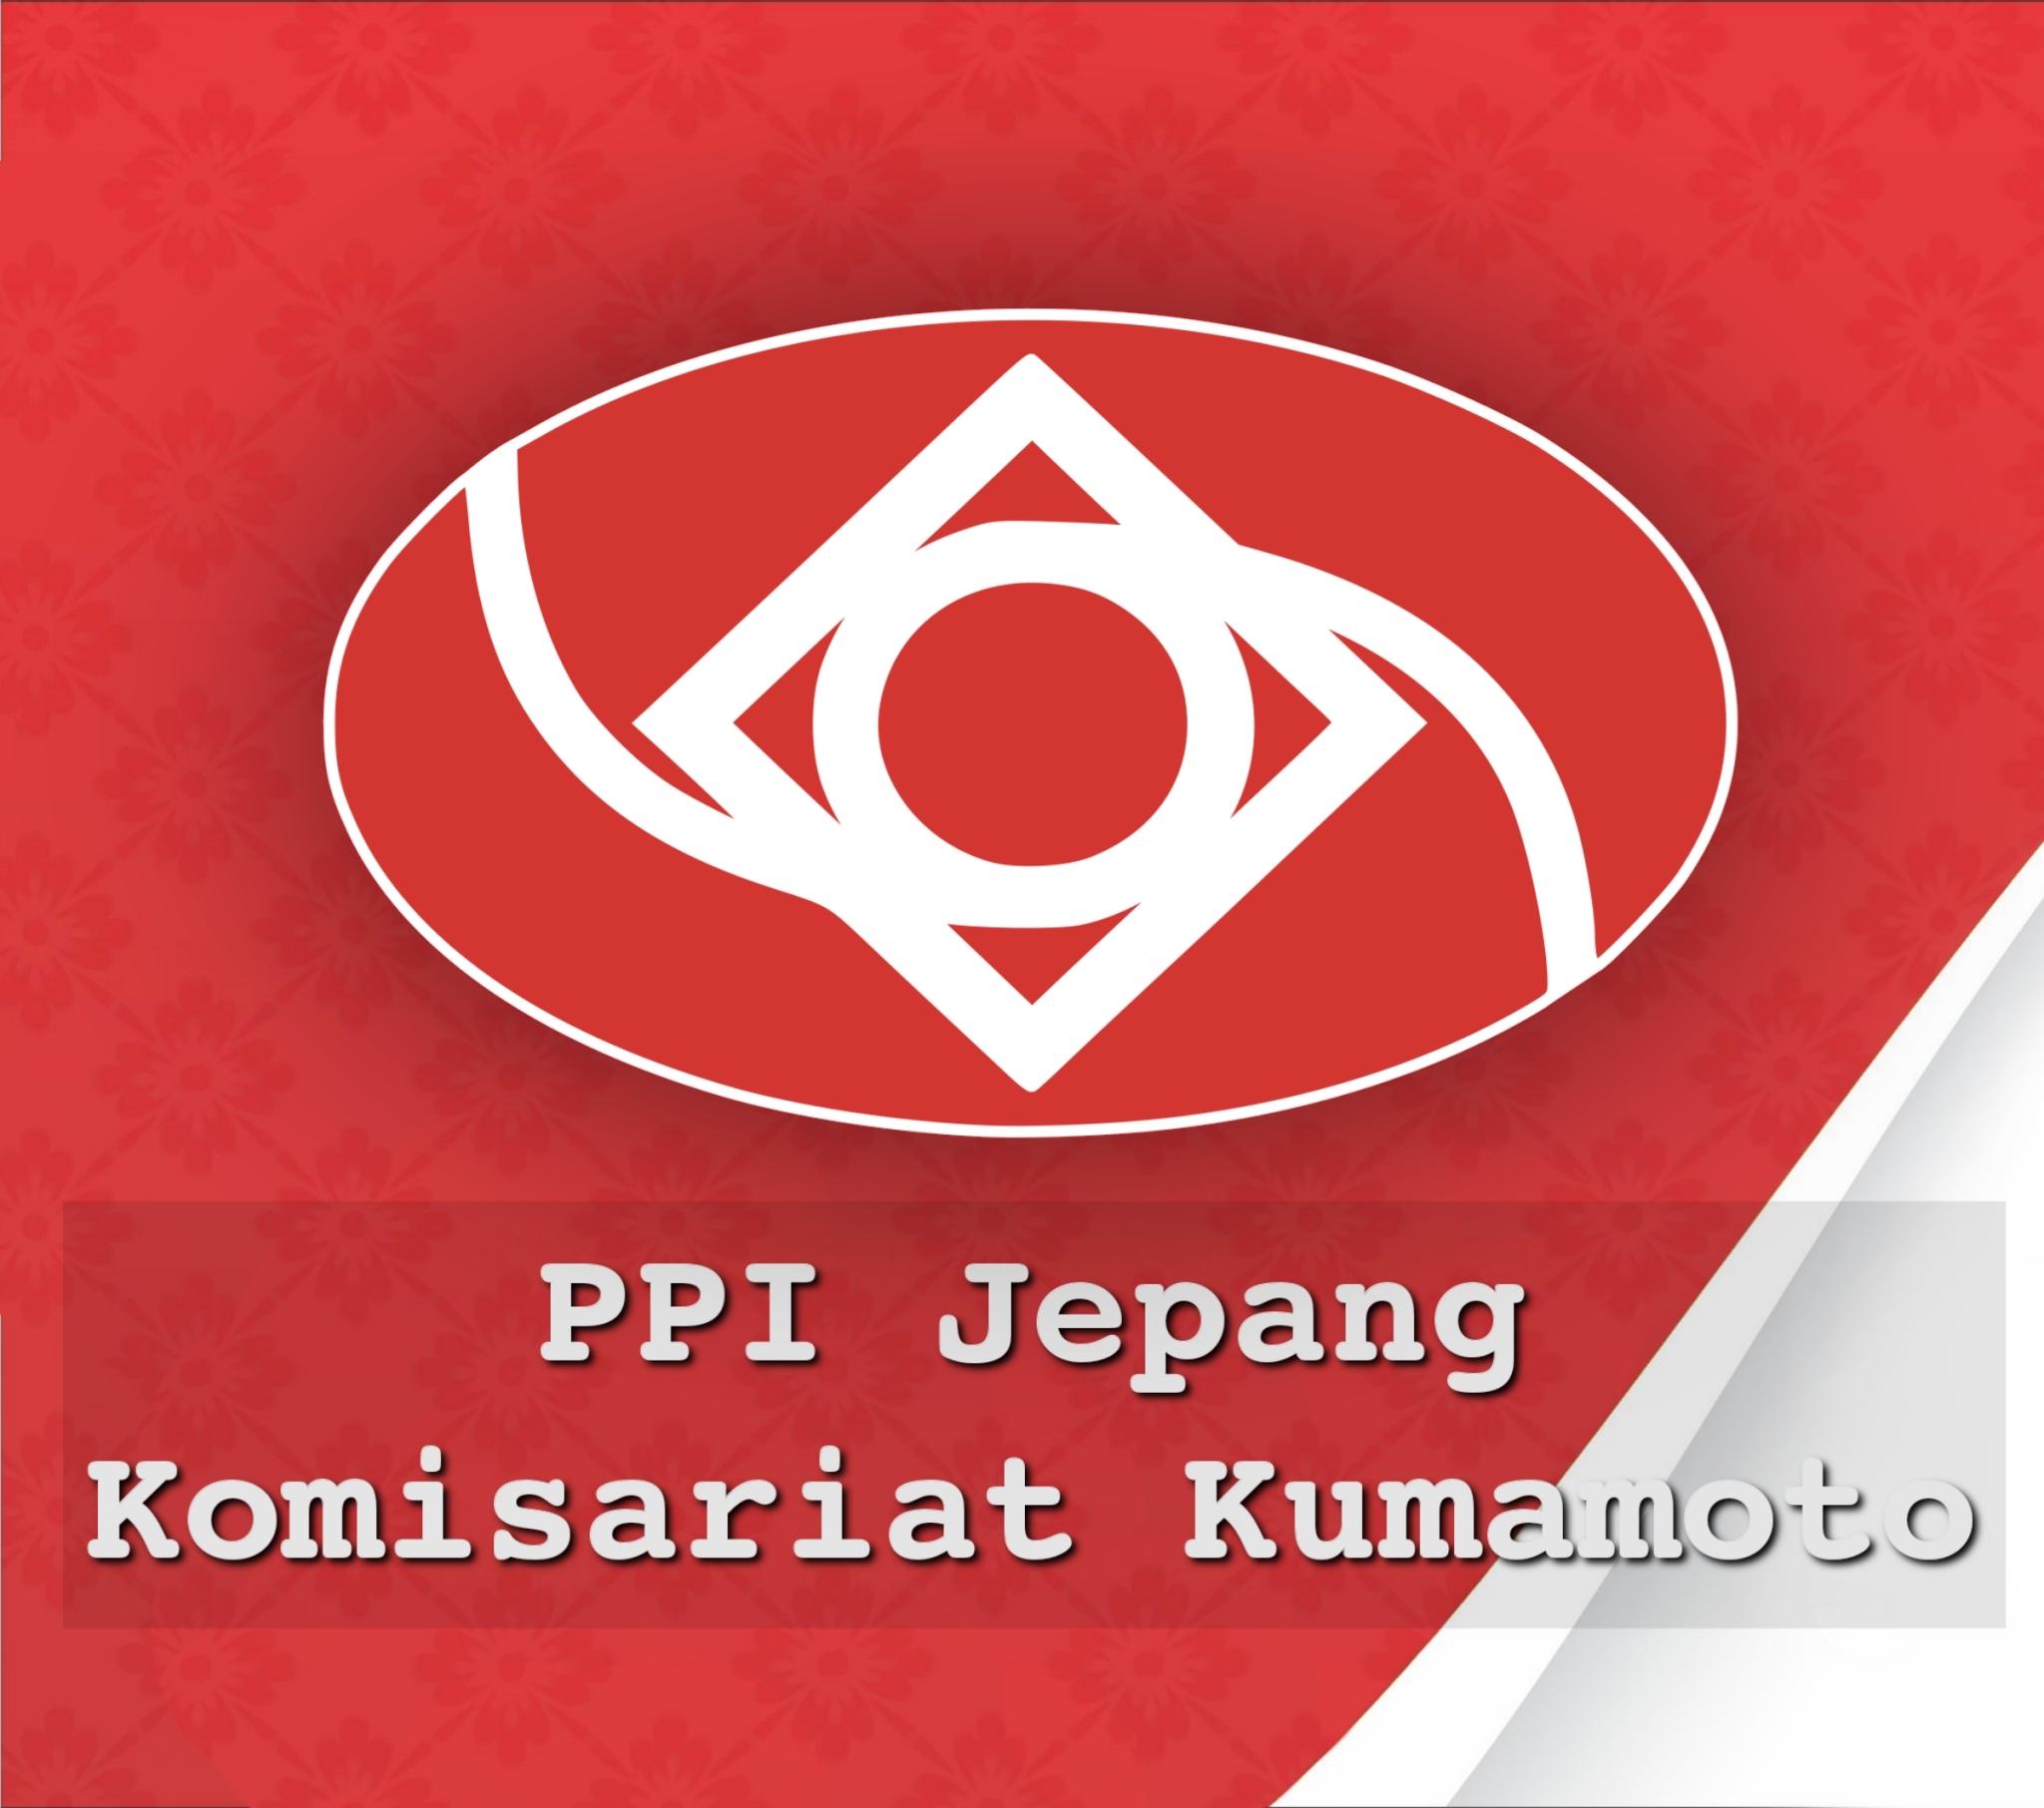 PPI Jepang Kumamoto